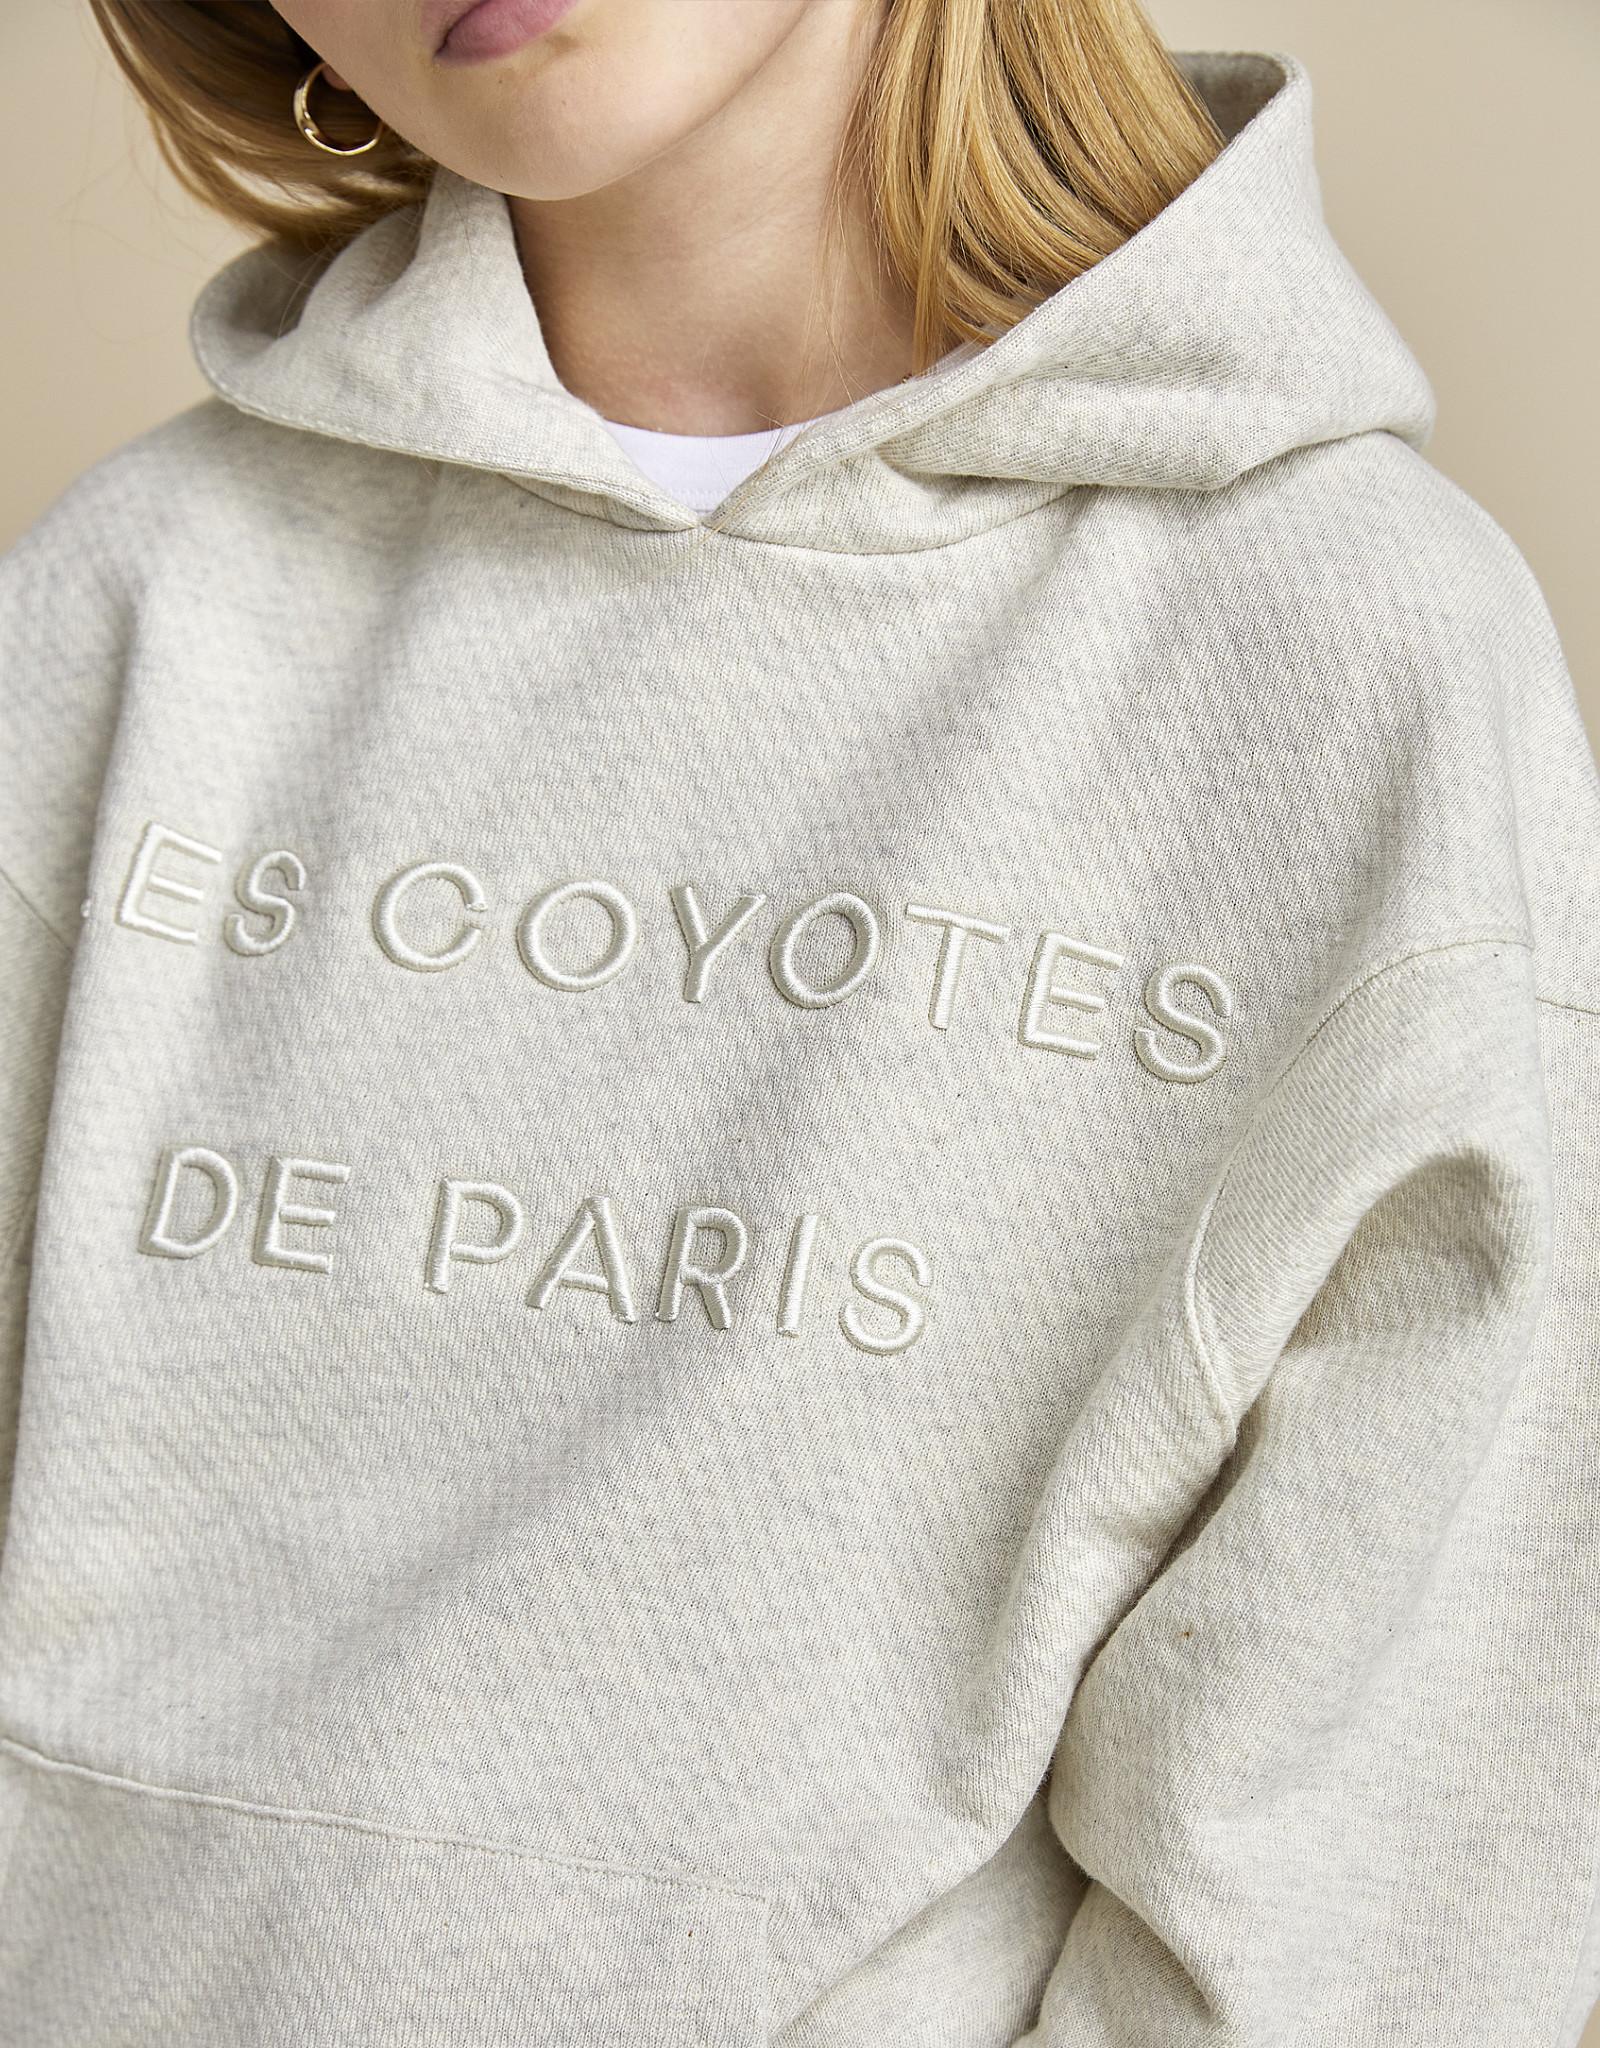 LES COYOTES DE PARIS LES COYOTES DE PARIS Boaz cream melange